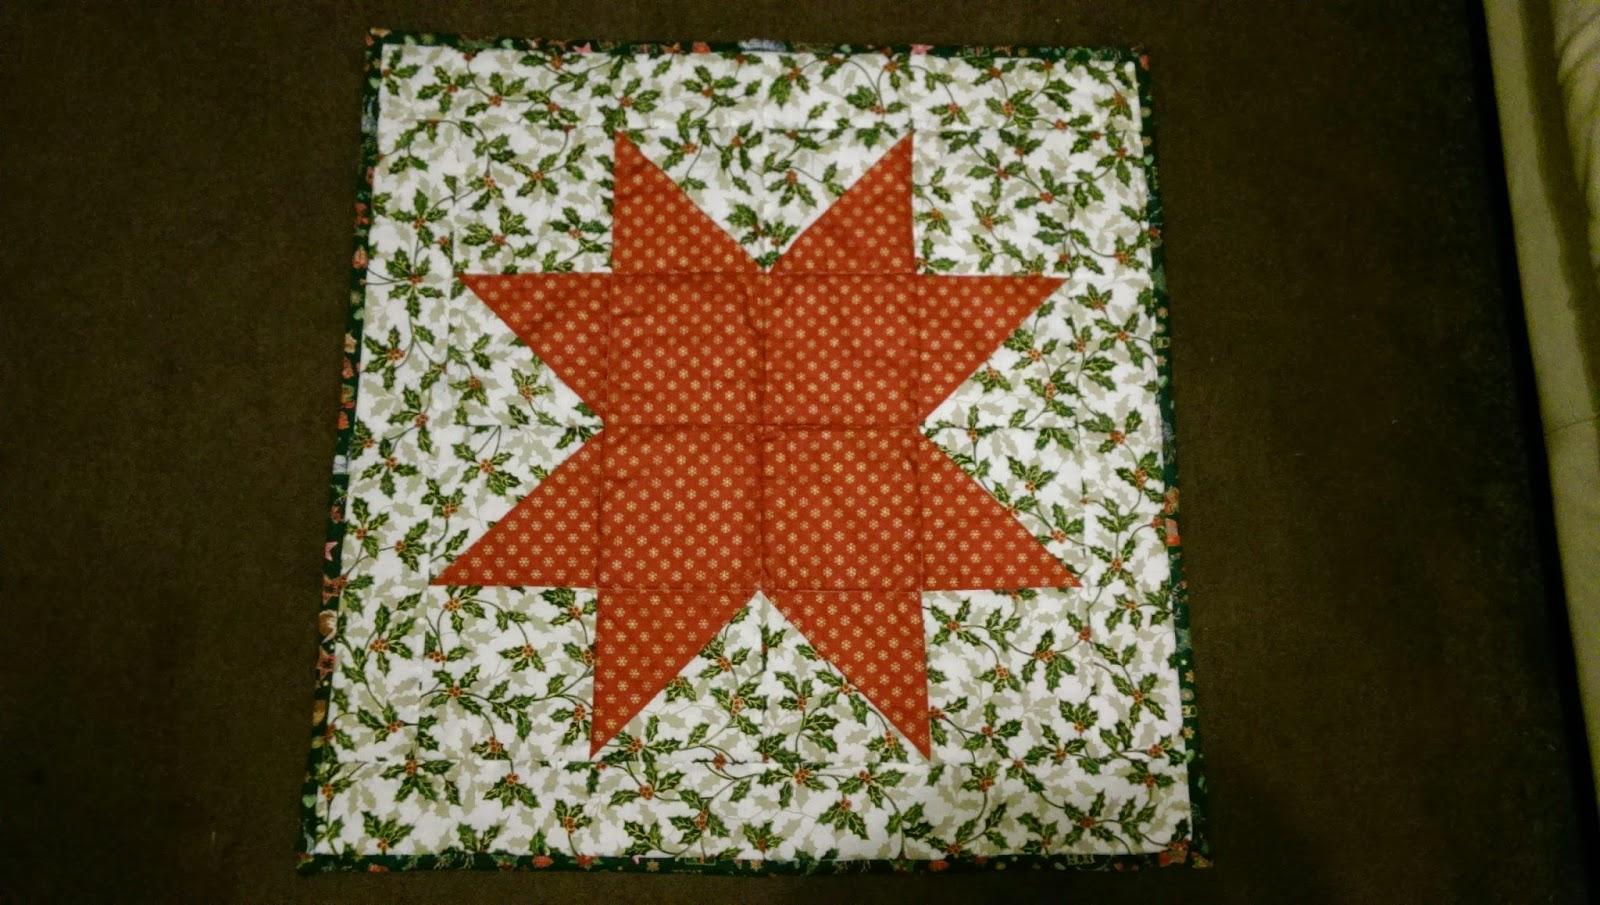 http://jennifercatherineshaw.blogspot.com/2014/11/ohio-star-quilt.html